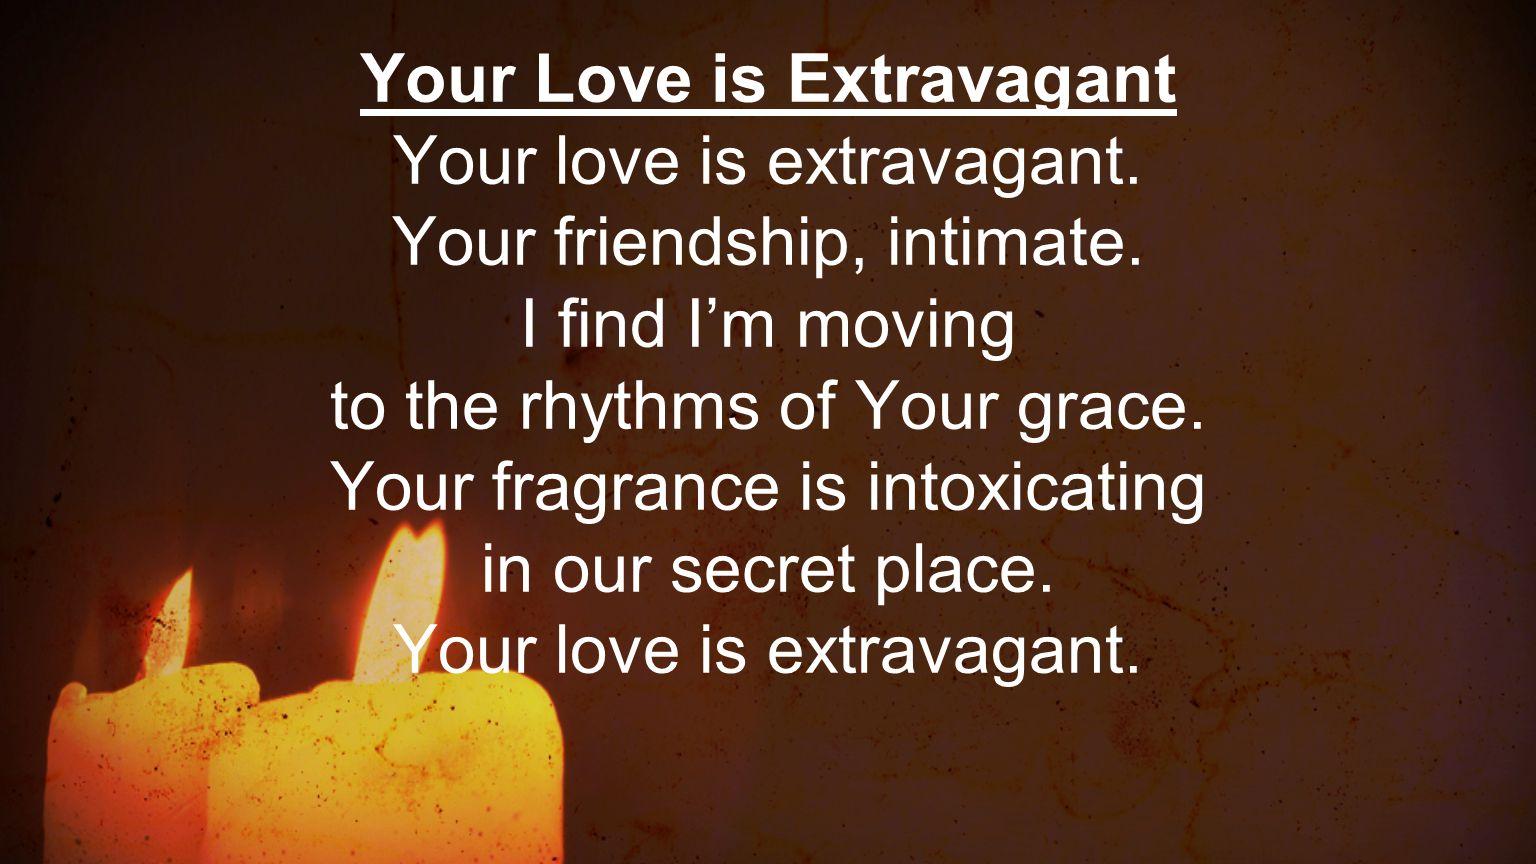 Your Love is Extravagant Your love is extravagant.